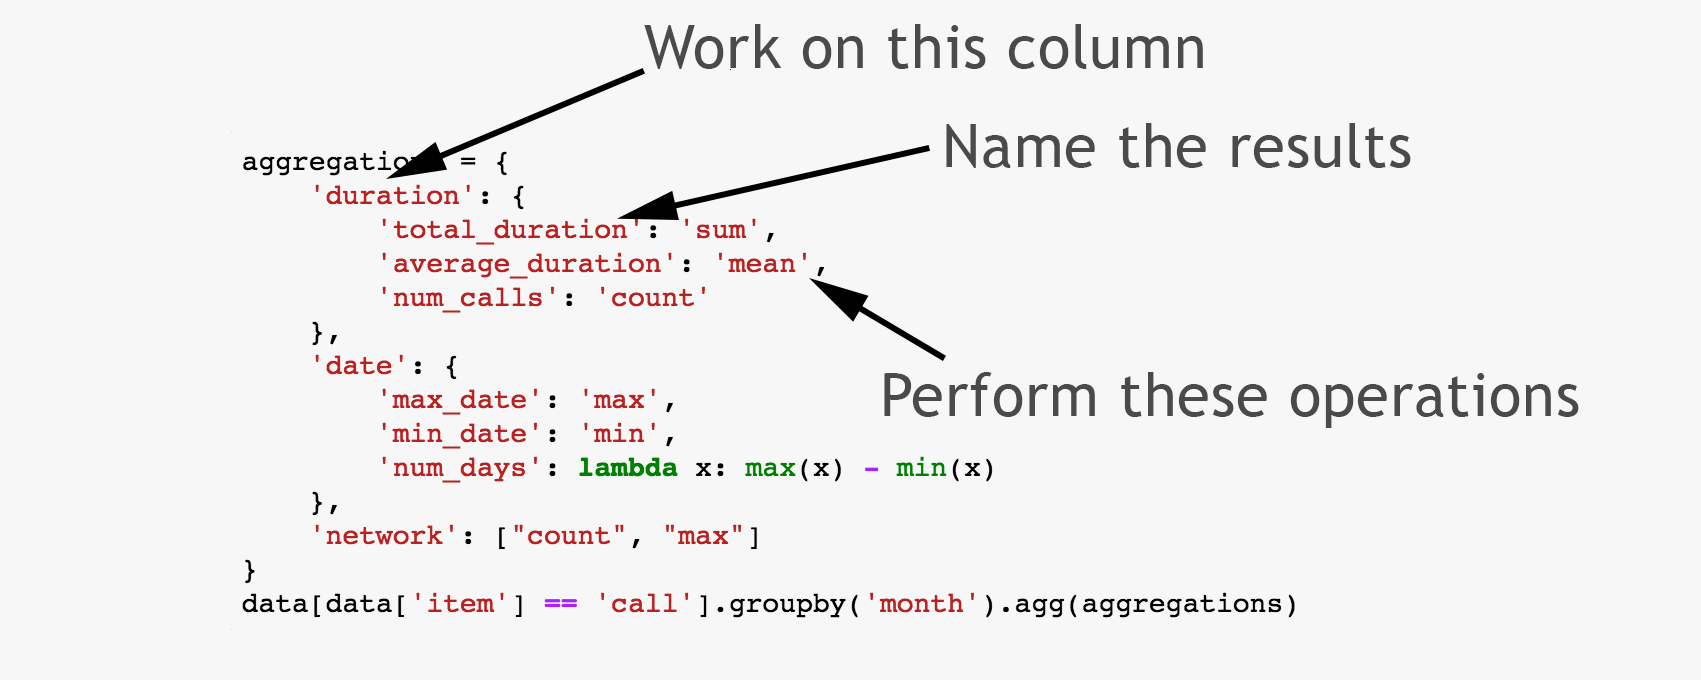 iloc, loc, and ix for data selection in Python Pandas | Shane Lynn